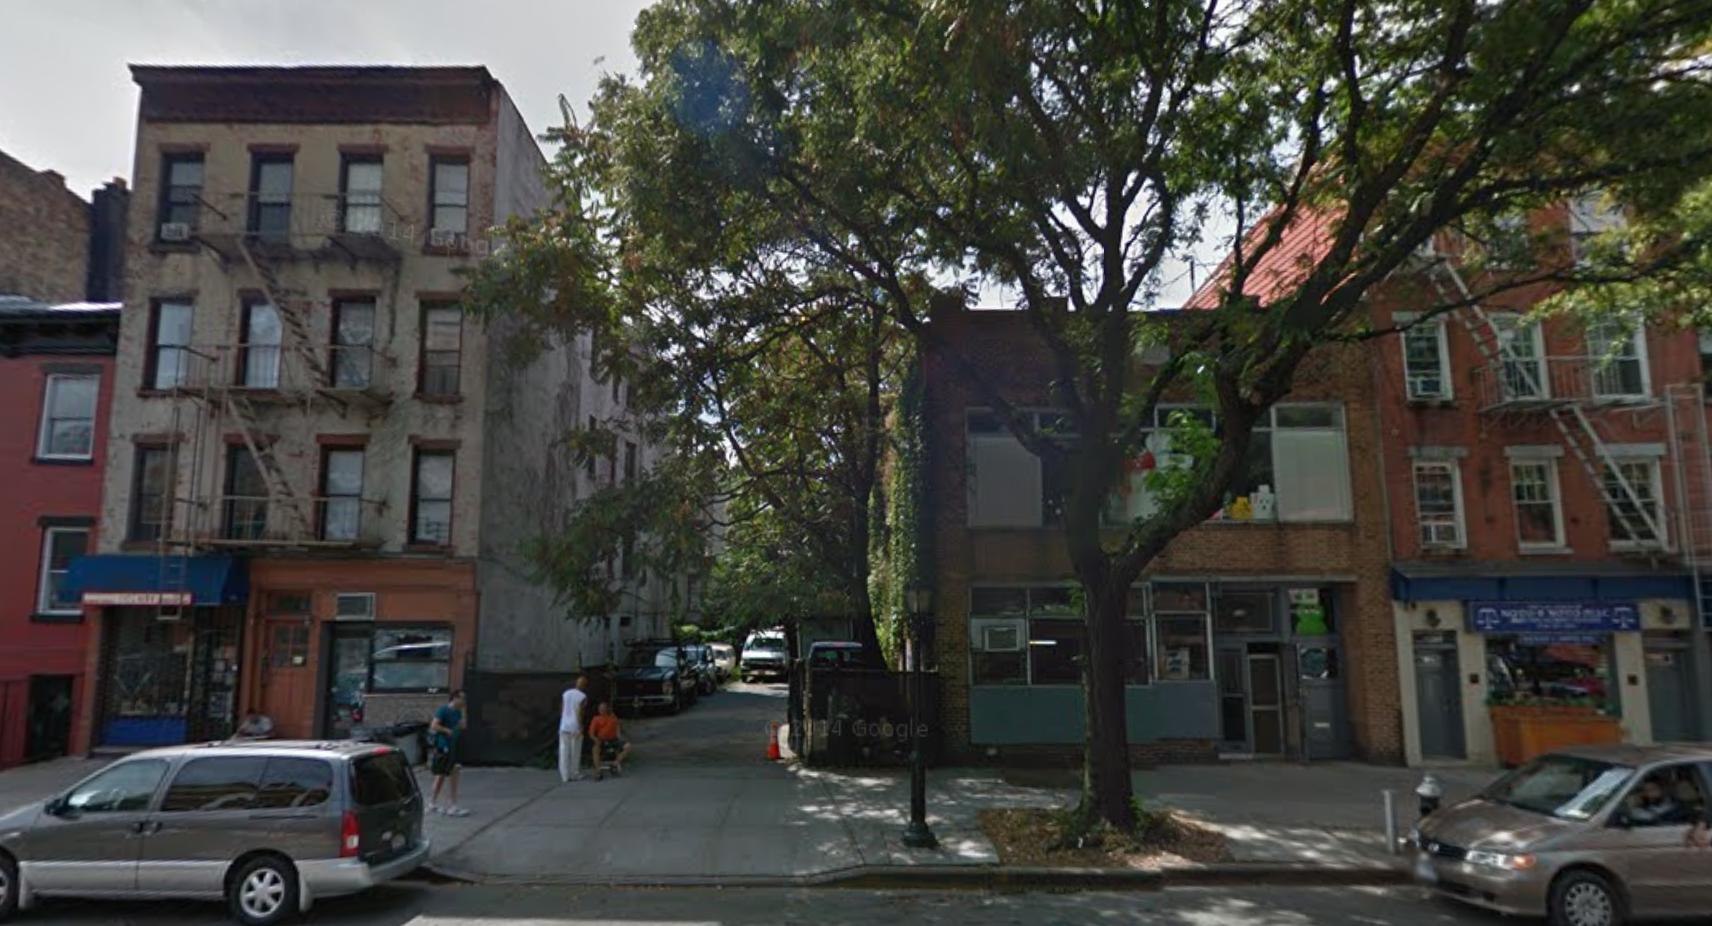 330 Atlantic Avenue, image via Google Maps